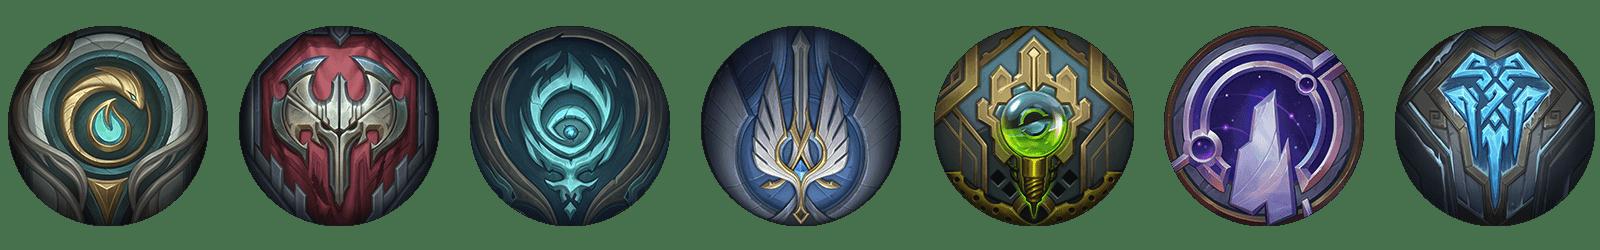 1.16_patch_notes_region_rewards.png